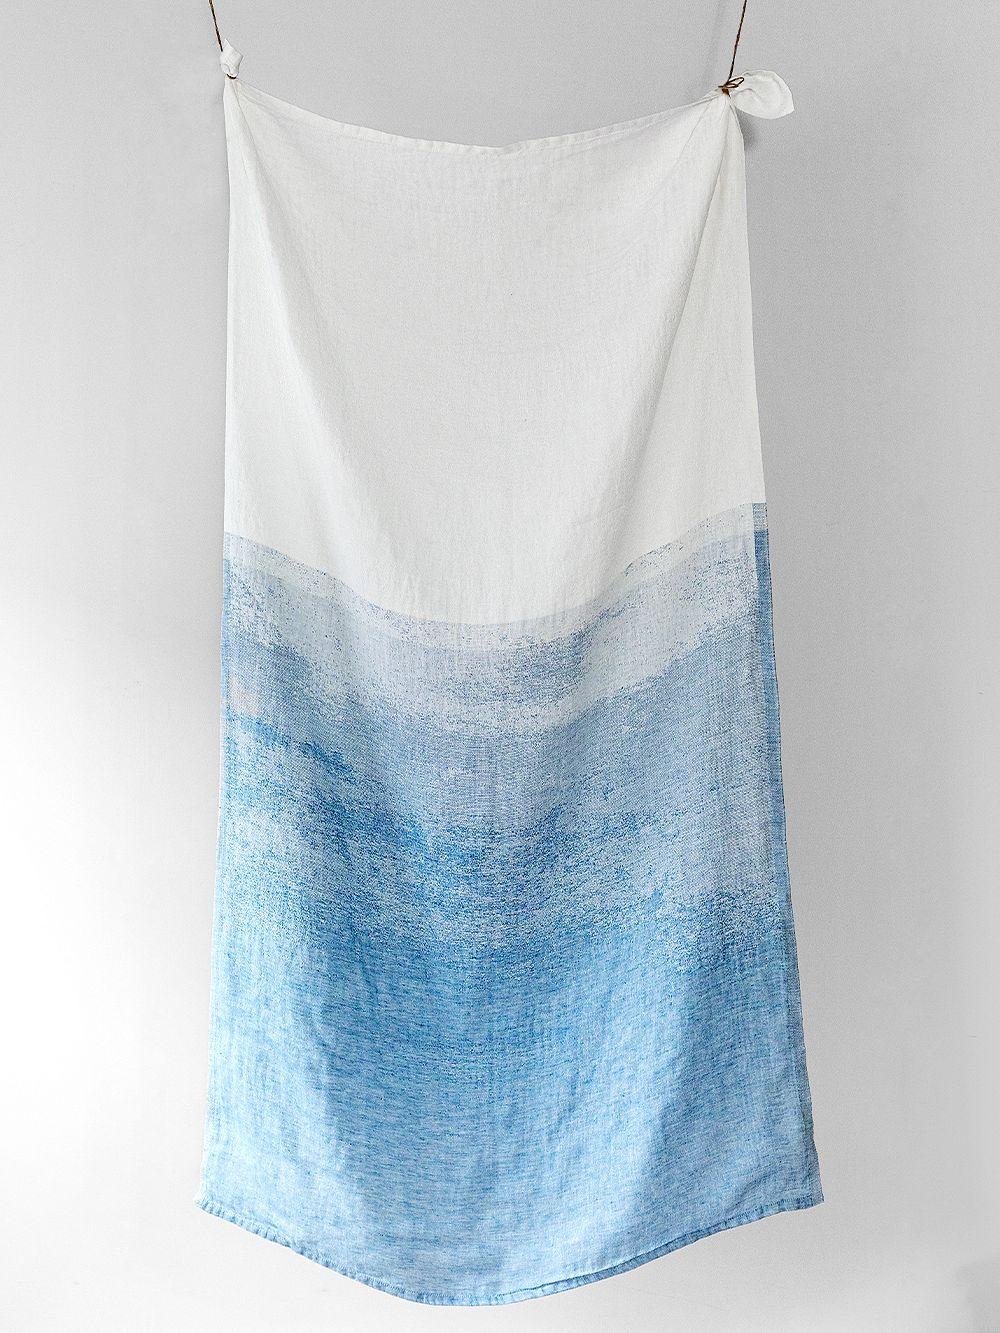 Lapuan Kankurit Saari giant towel